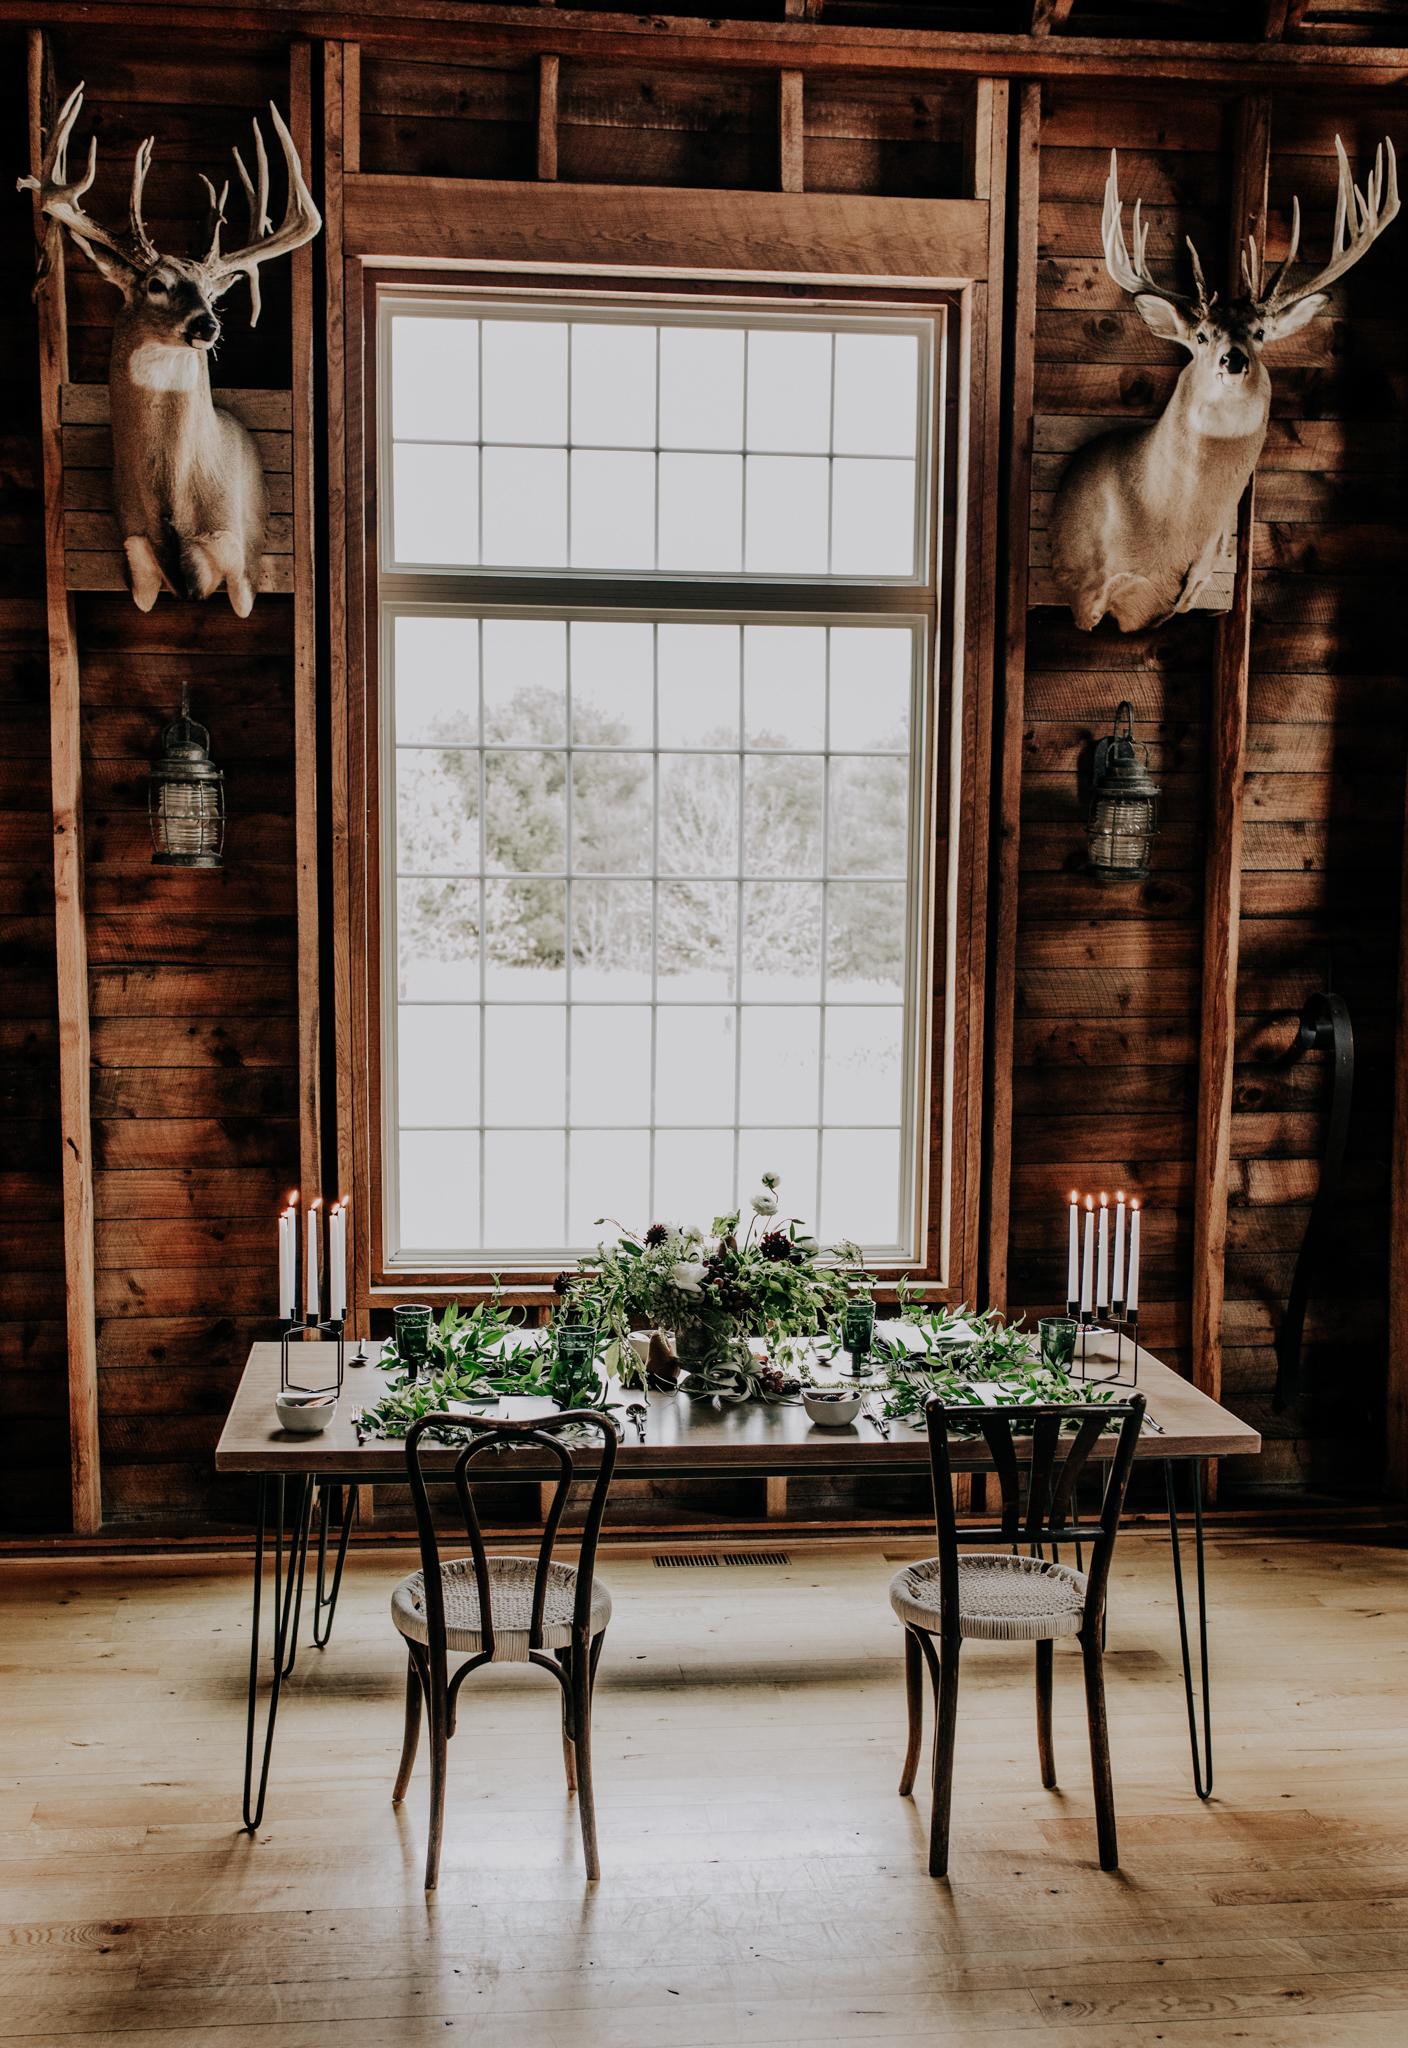 Rad Photographers - Rustic Wedding Decor - Cabin Elopement - Hove Photography - Magnolia Market Placesettings